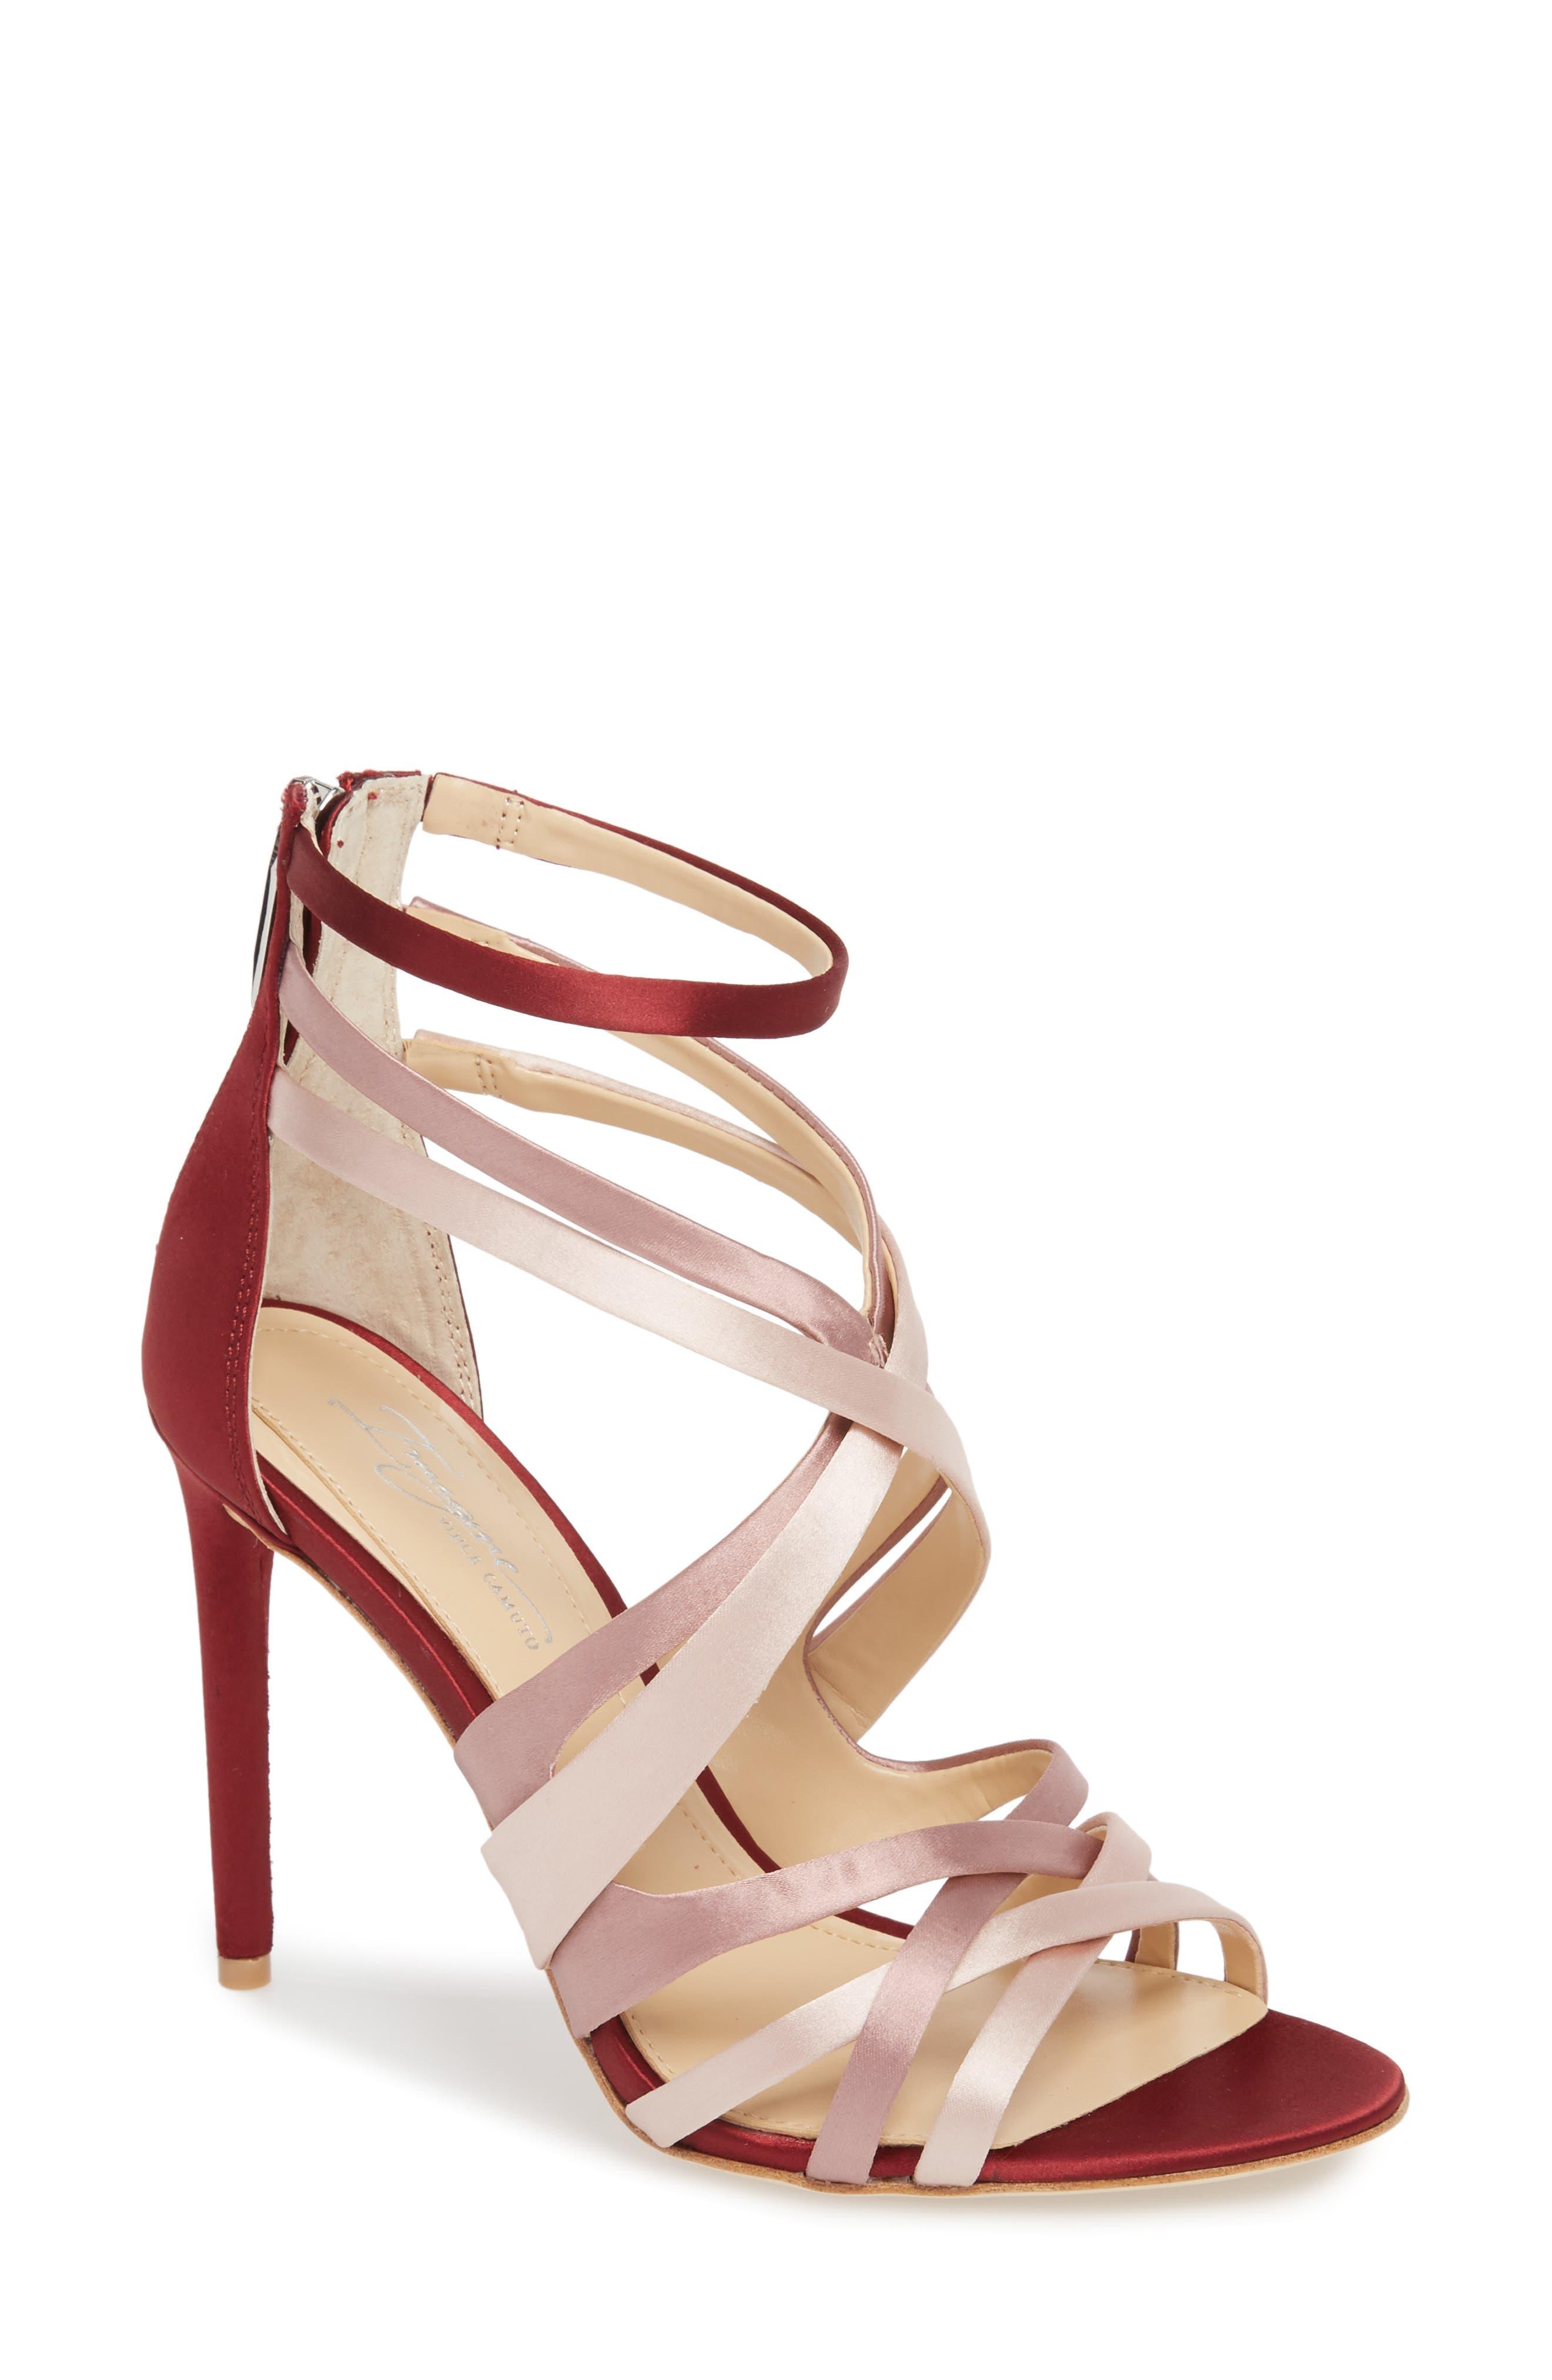 Ress Sandal,                         Main,                         color, DUSTY ROSE SATIN